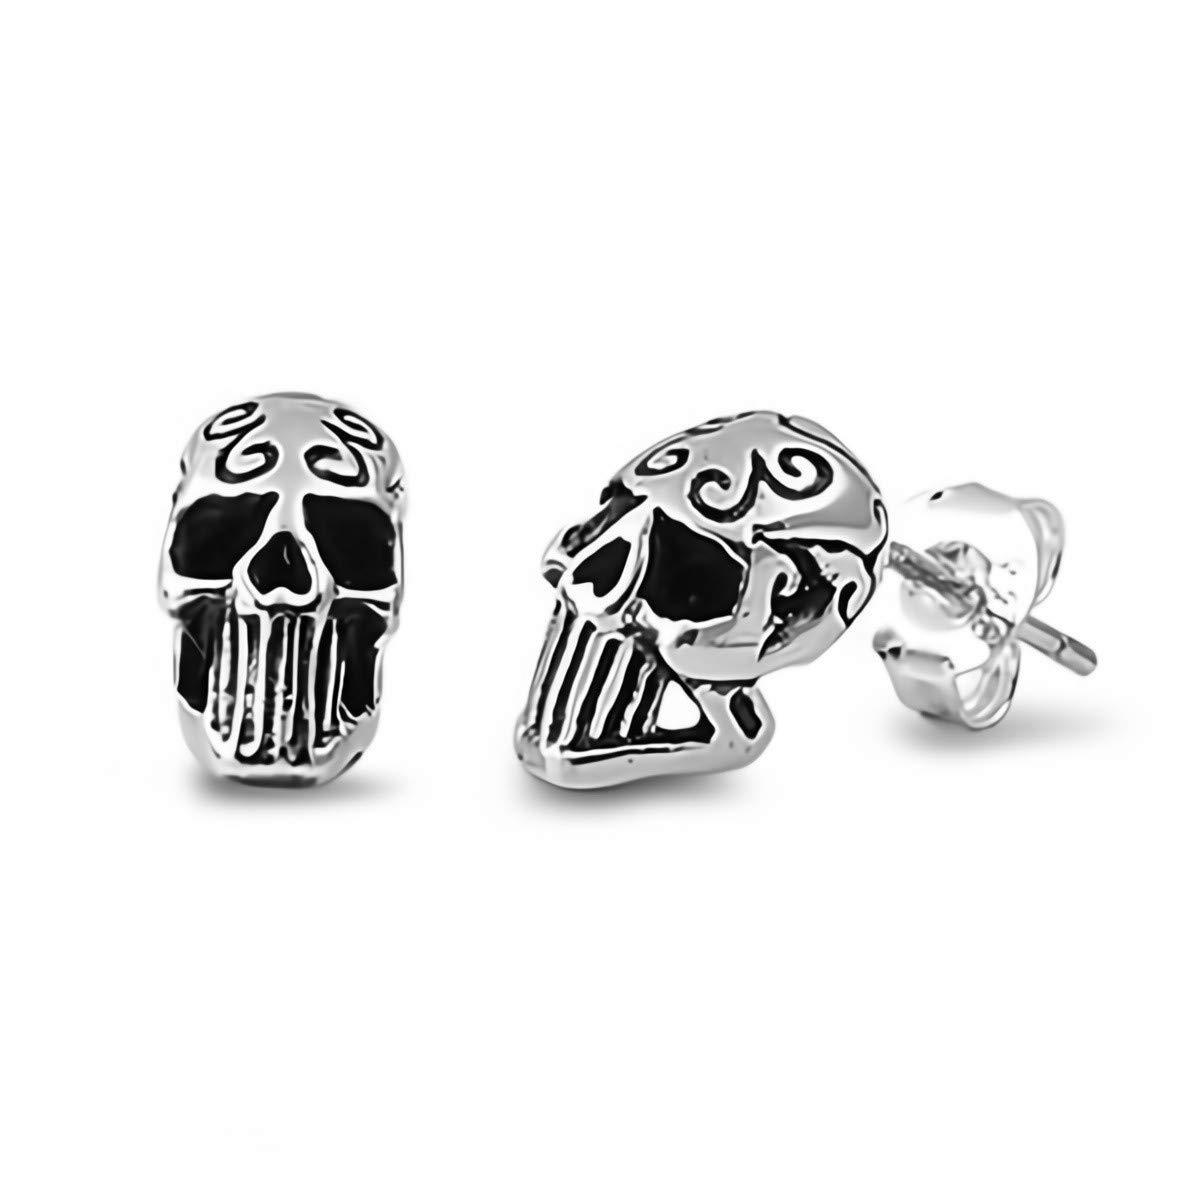 Glitzs Jewels 925 Sterling Silver Small Stud Earrings for Women and Girls Skull Head